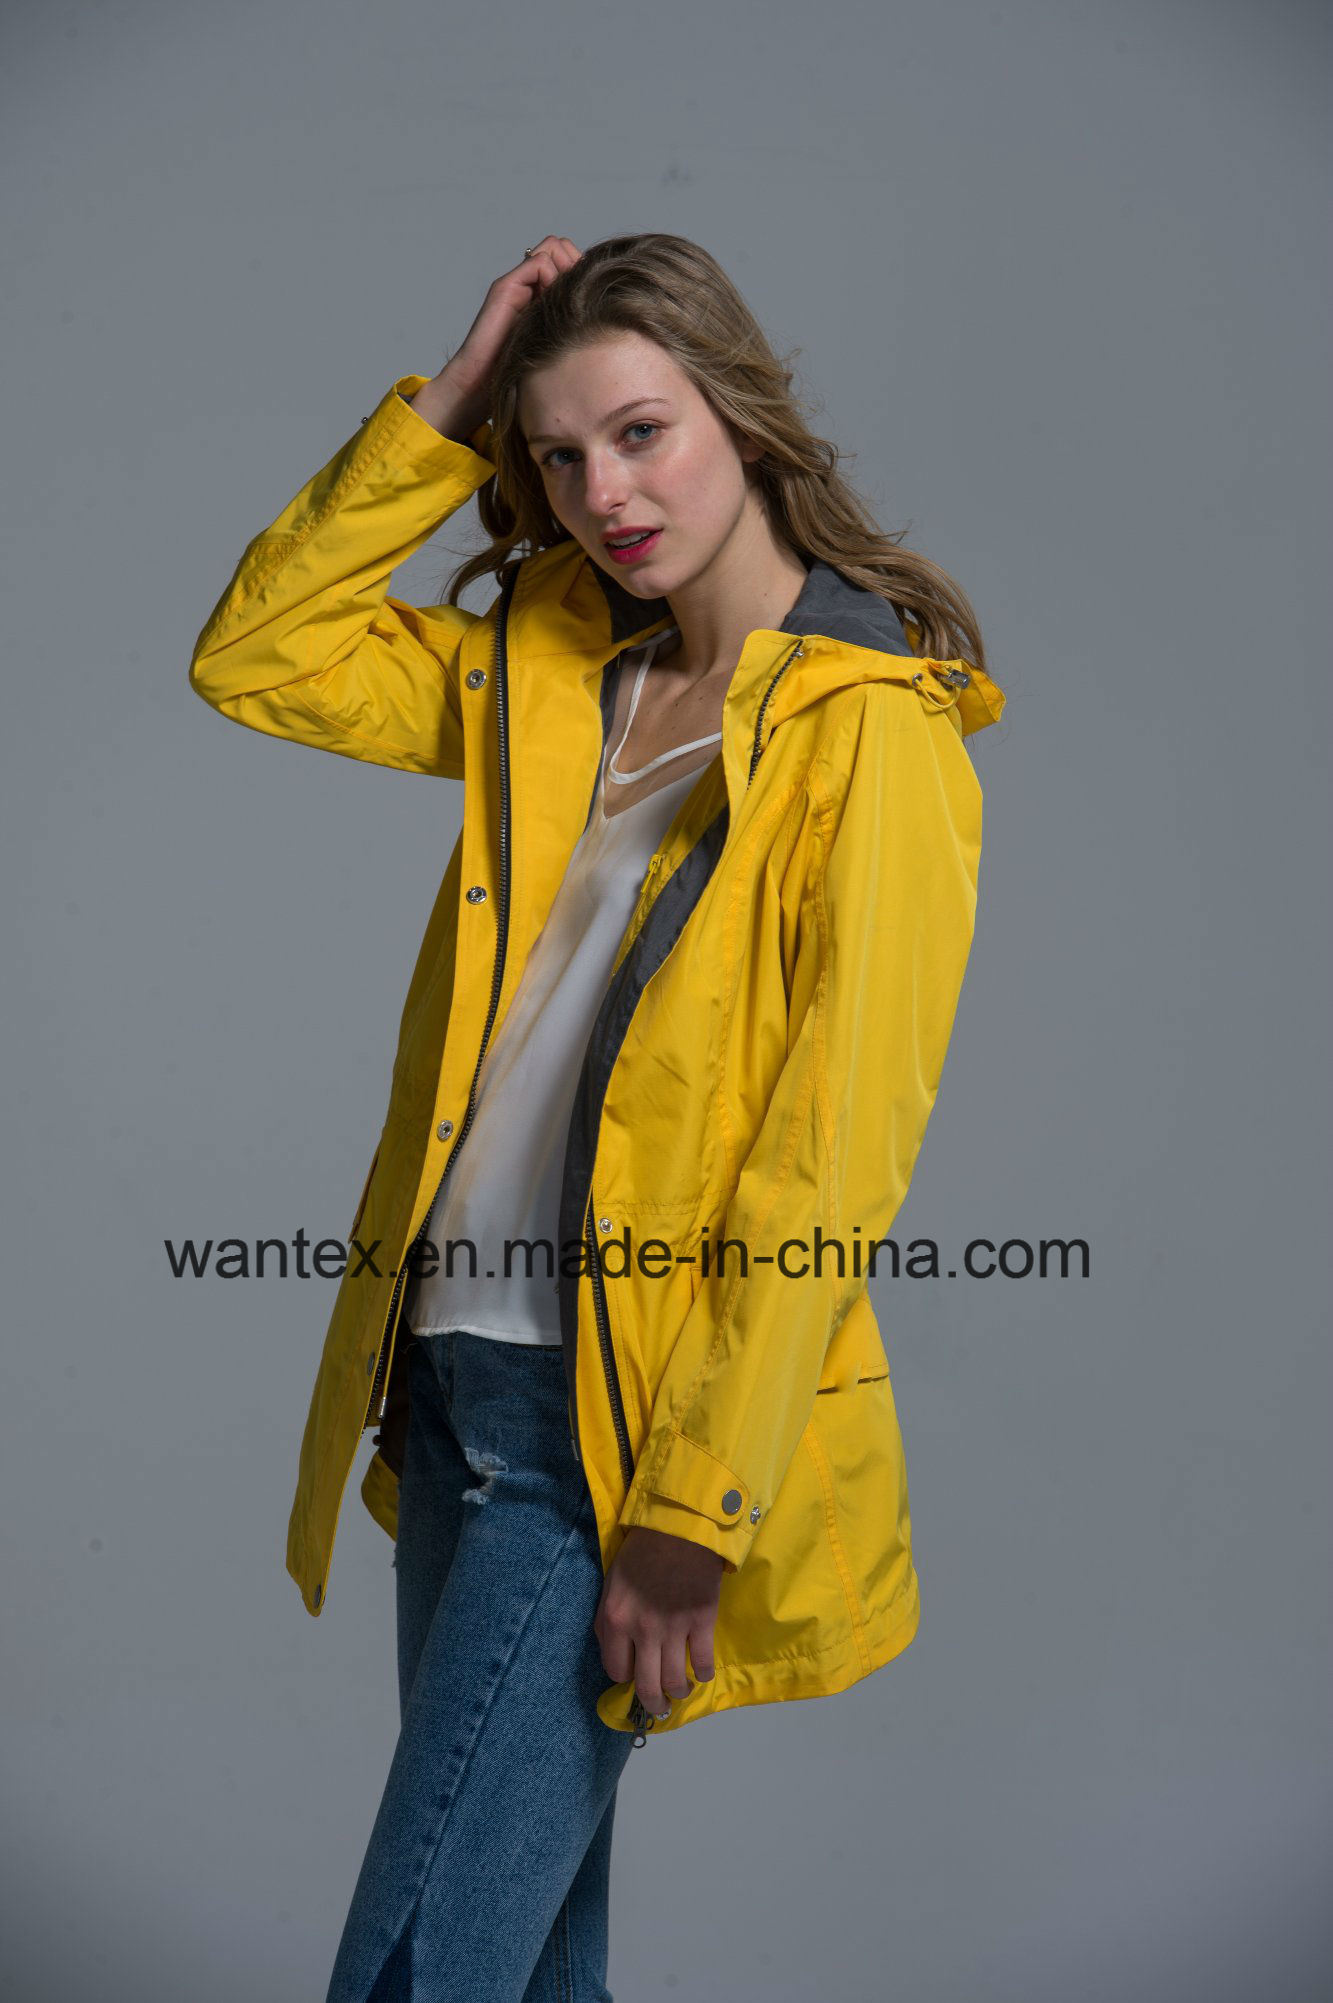 Ladies Loose Jacket Pizex Fashion 100% Cotton Spring Autumn Yellow Waterproof